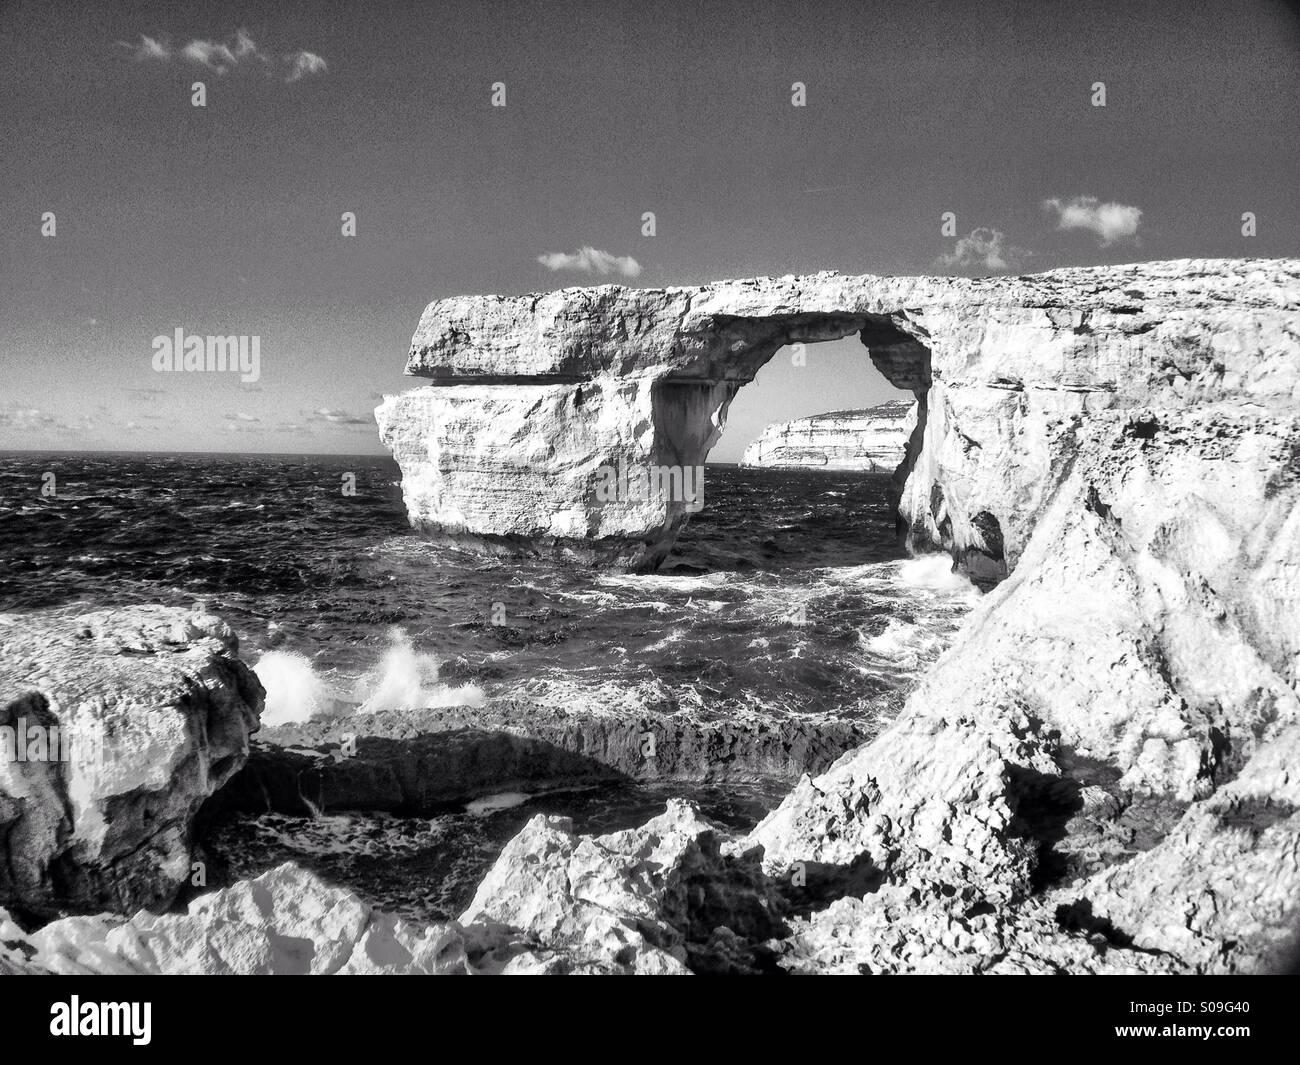 Stormy seas d'hiver à l'Azure Window. Monochrome Photo Stock